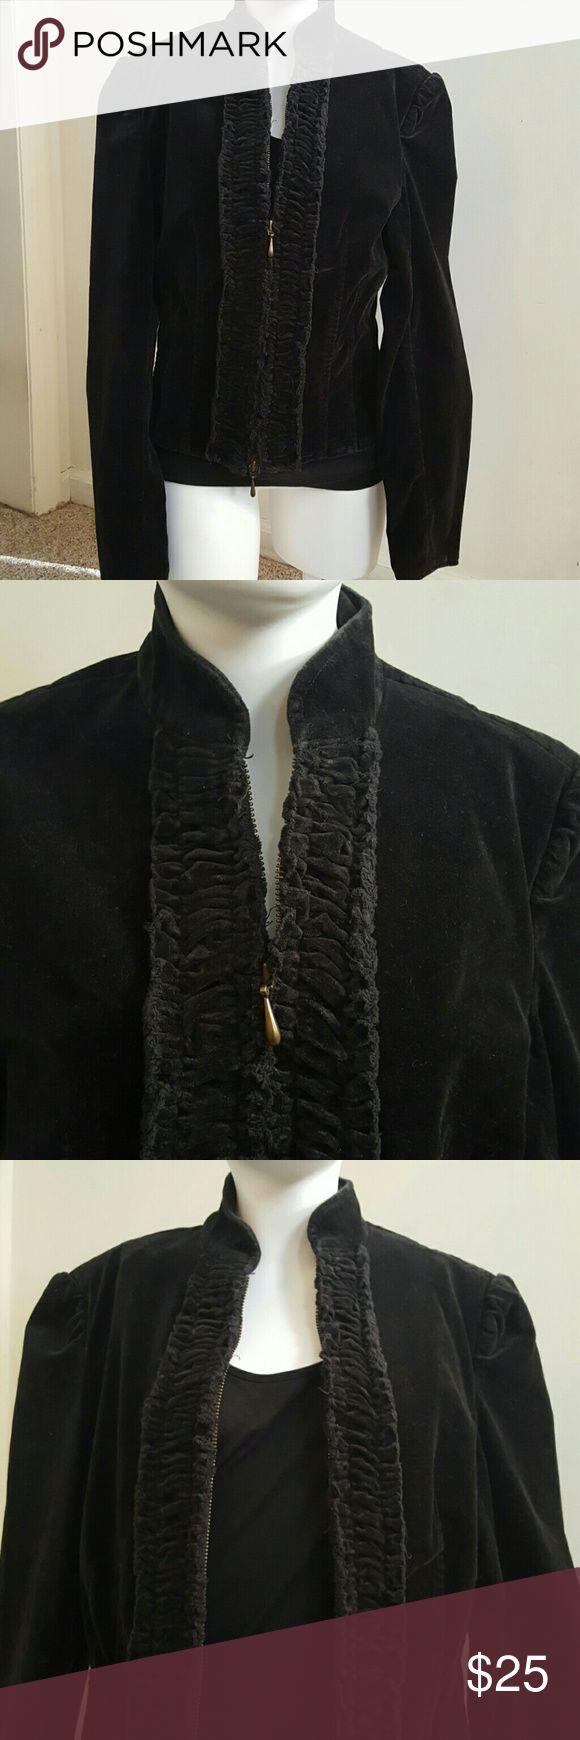 Never worn Express velour jacket. Black zipper velour jacket. Cotton/spandex. Ruffle around the zipper. Precision fit Express Jackets & Coats